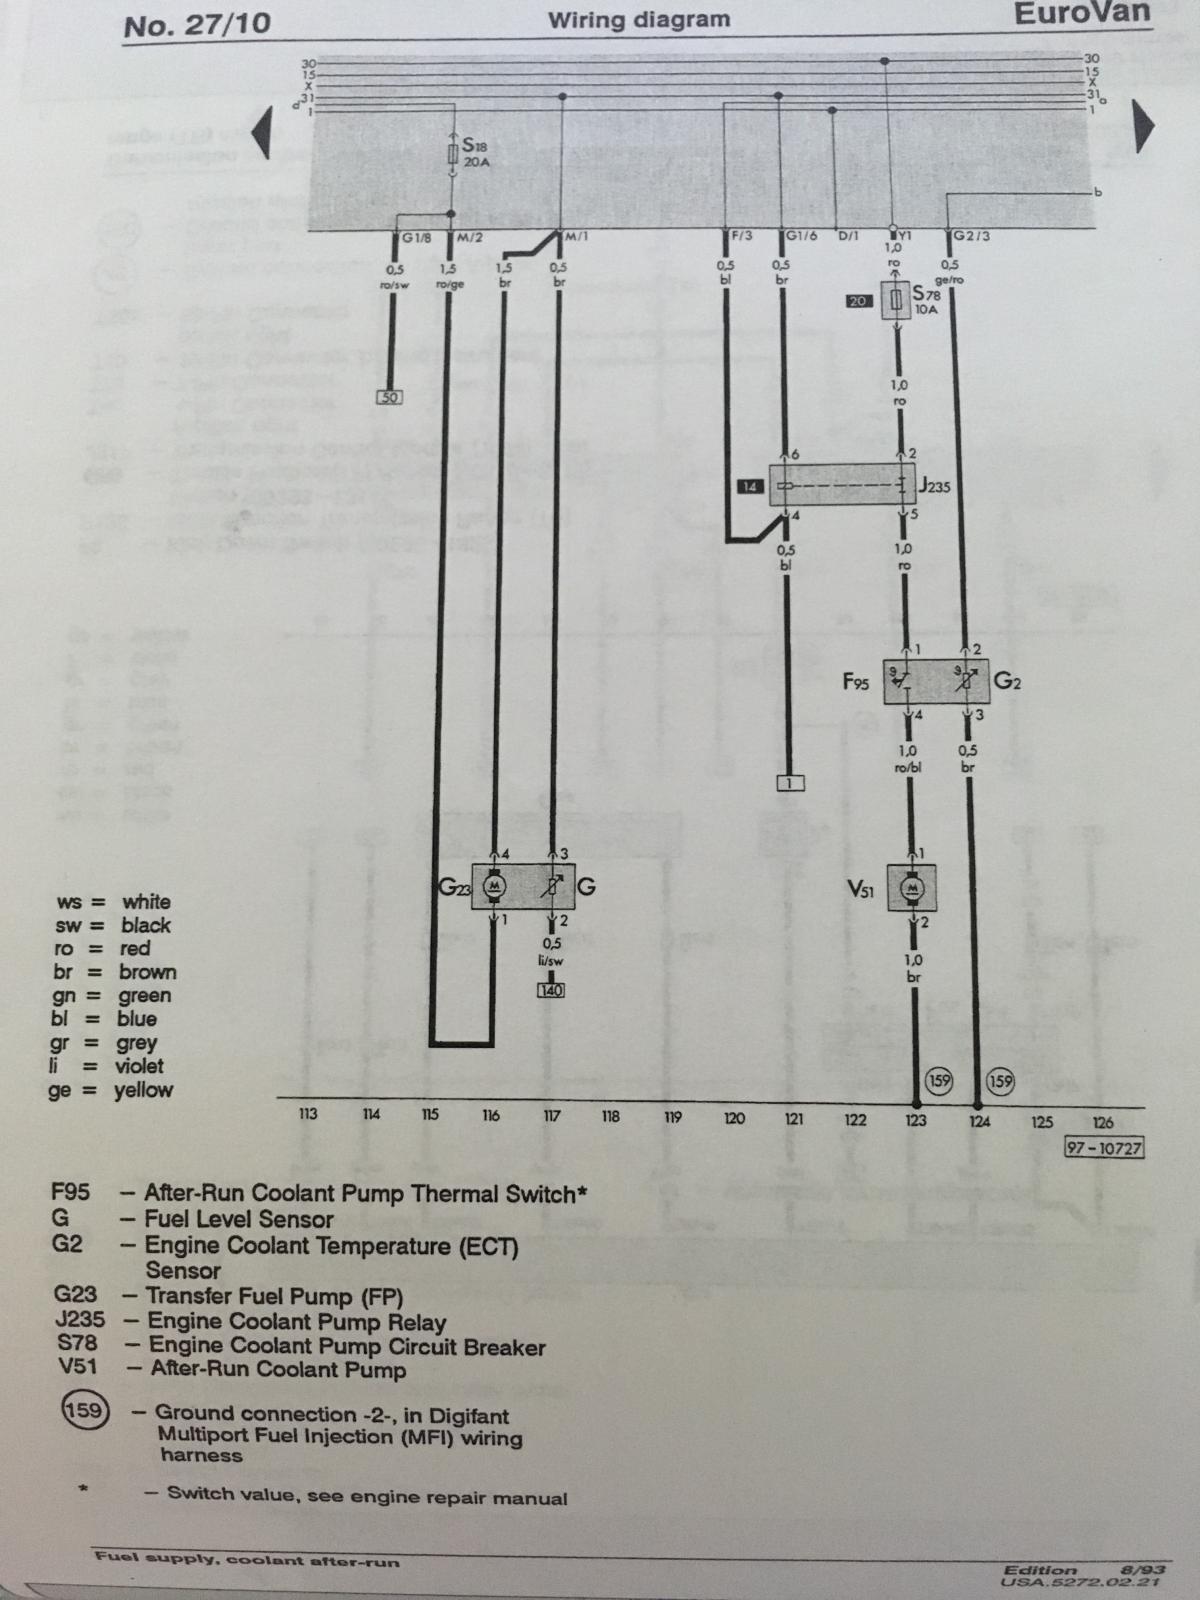 hight resolution of eurovan engine diagram wiring diagram centrethesamba com gallery 93 eurovan after run coolant pump wiring93 eurovan